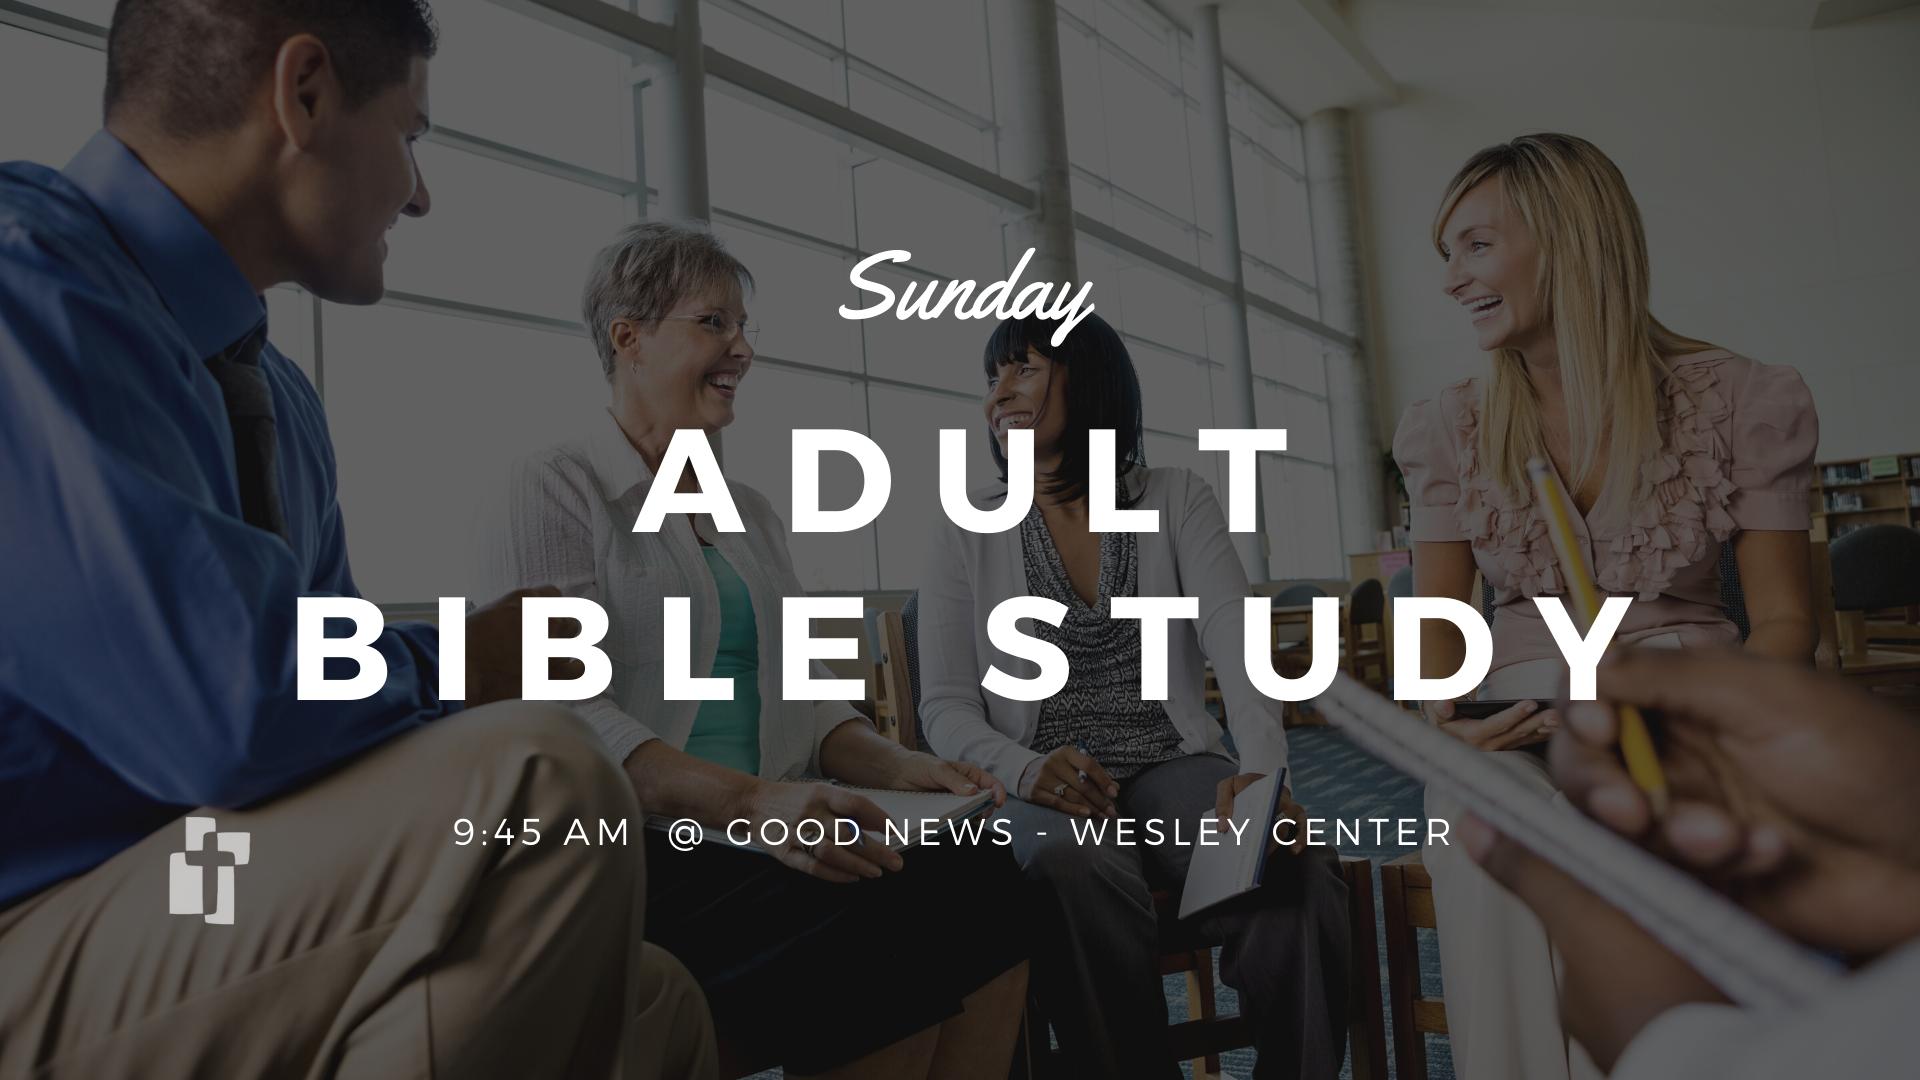 Sunday Adult Bible